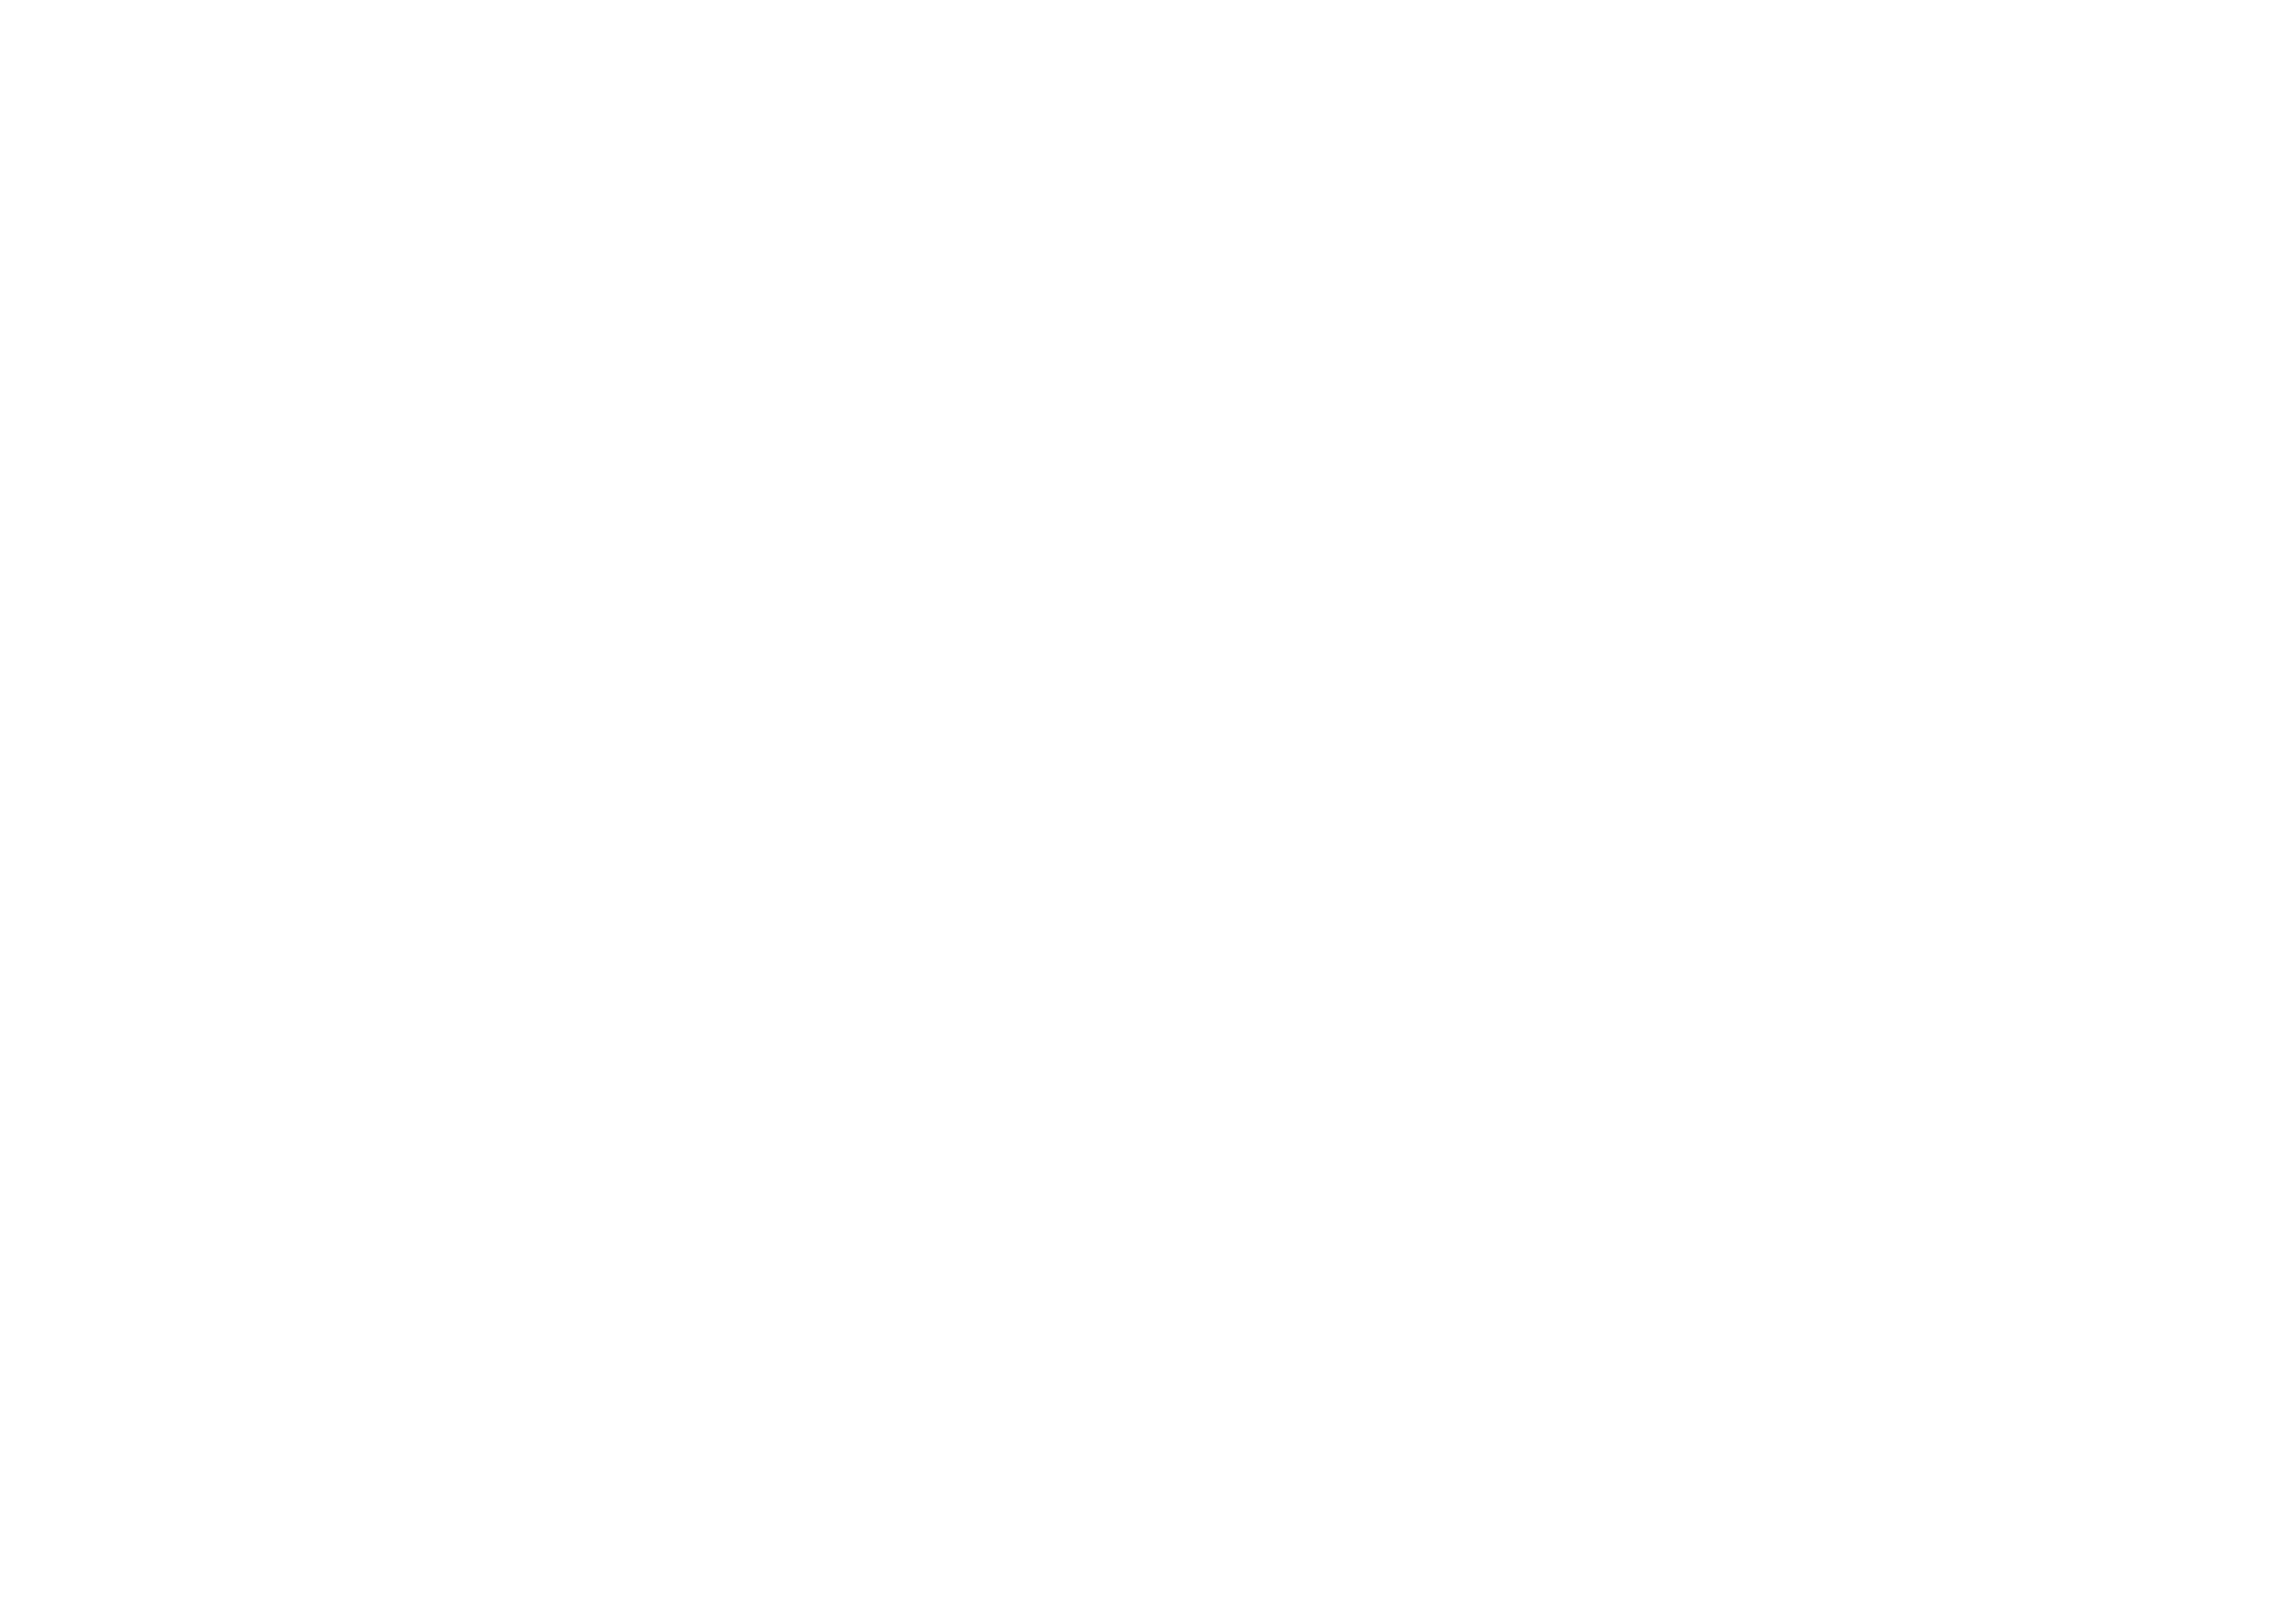 Maleen Johannsen